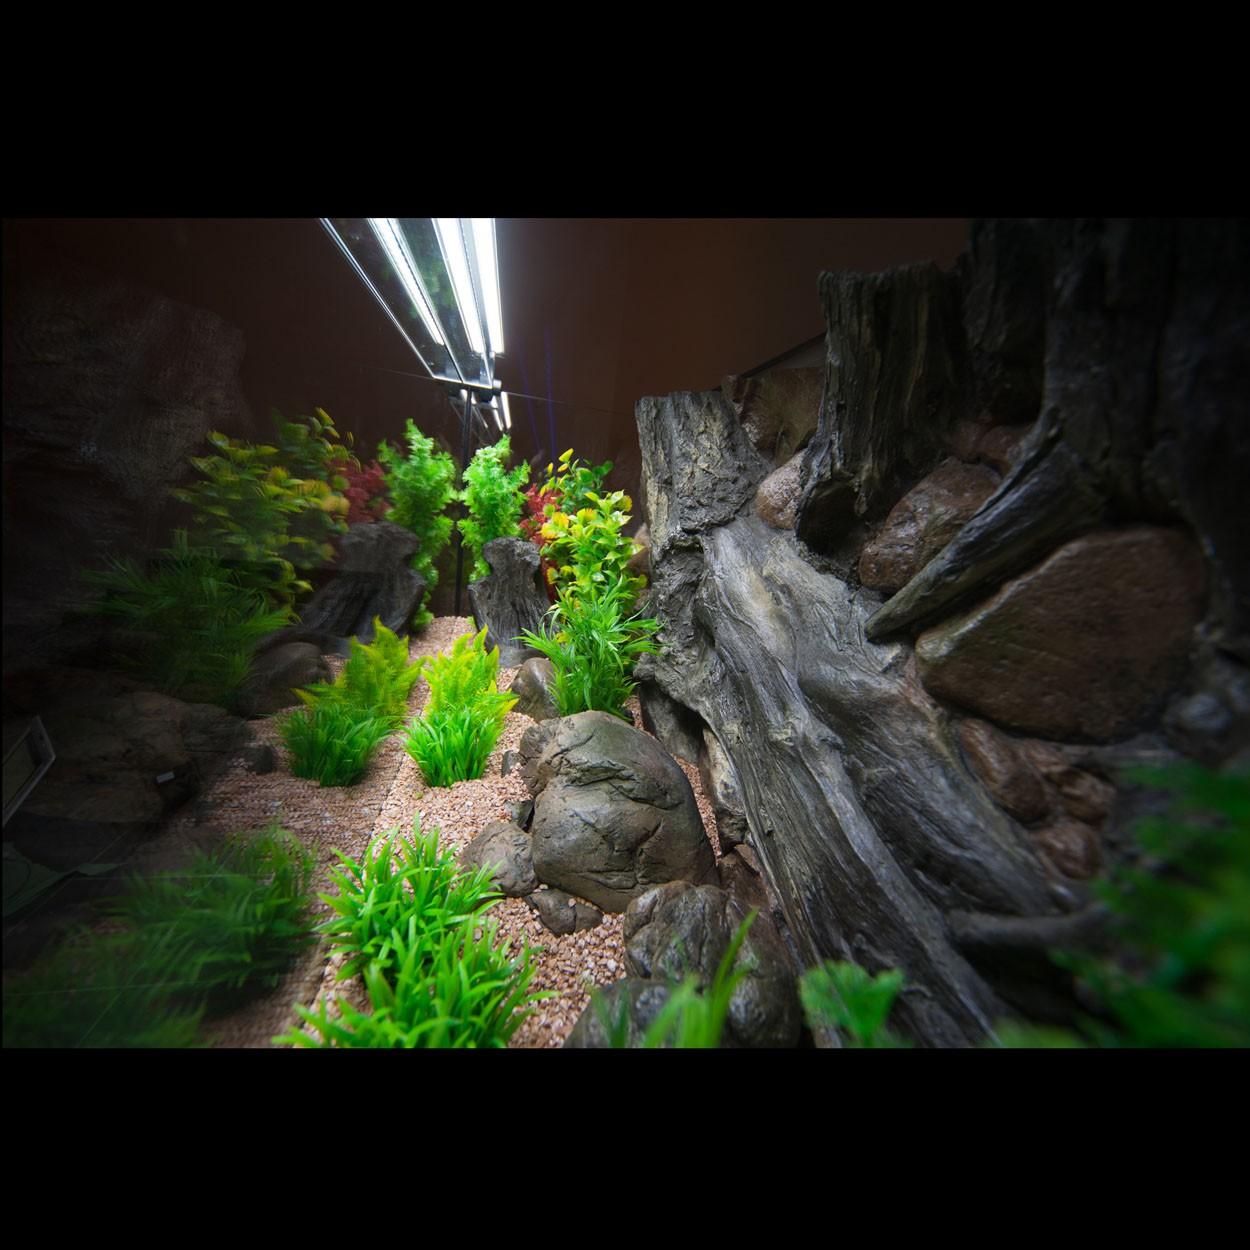 3d aquarium r ckwand f r rio 180 luxus line fif ebay - 3d ruckwand aquarium 150x60 ...